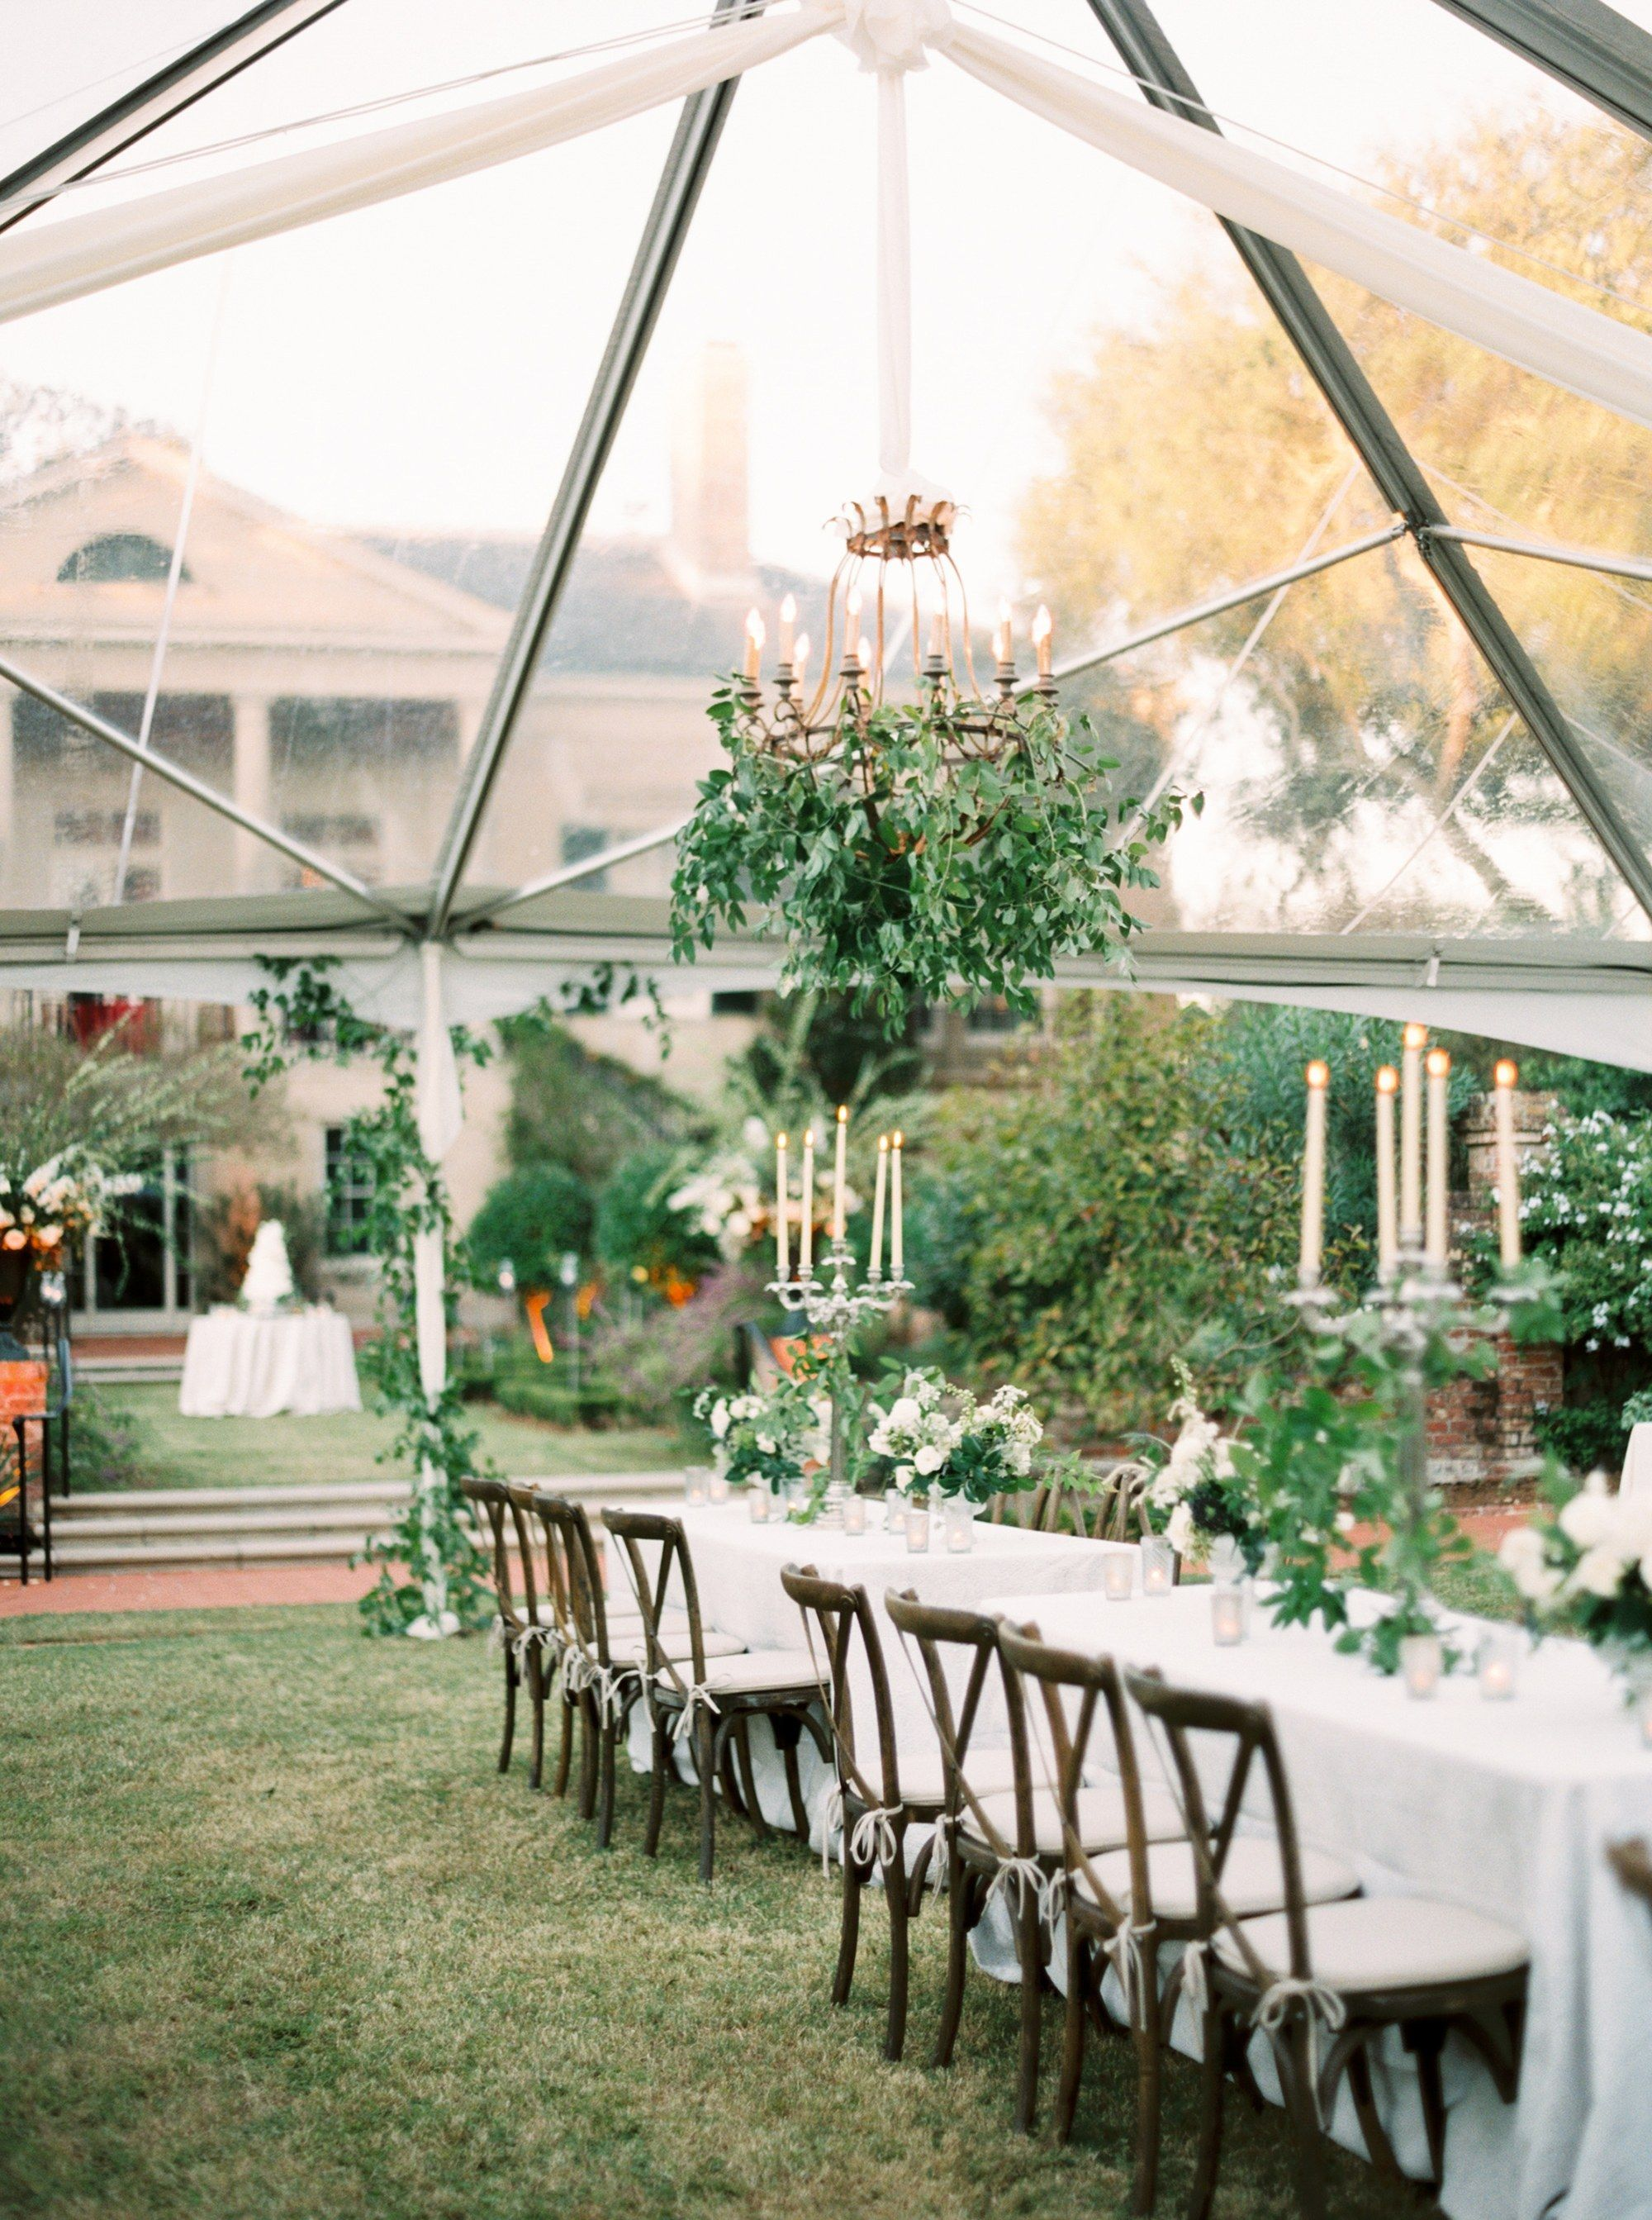 Hillary Hogan and Keith Putnam-Delaney's Garden Wedding in New Orleans